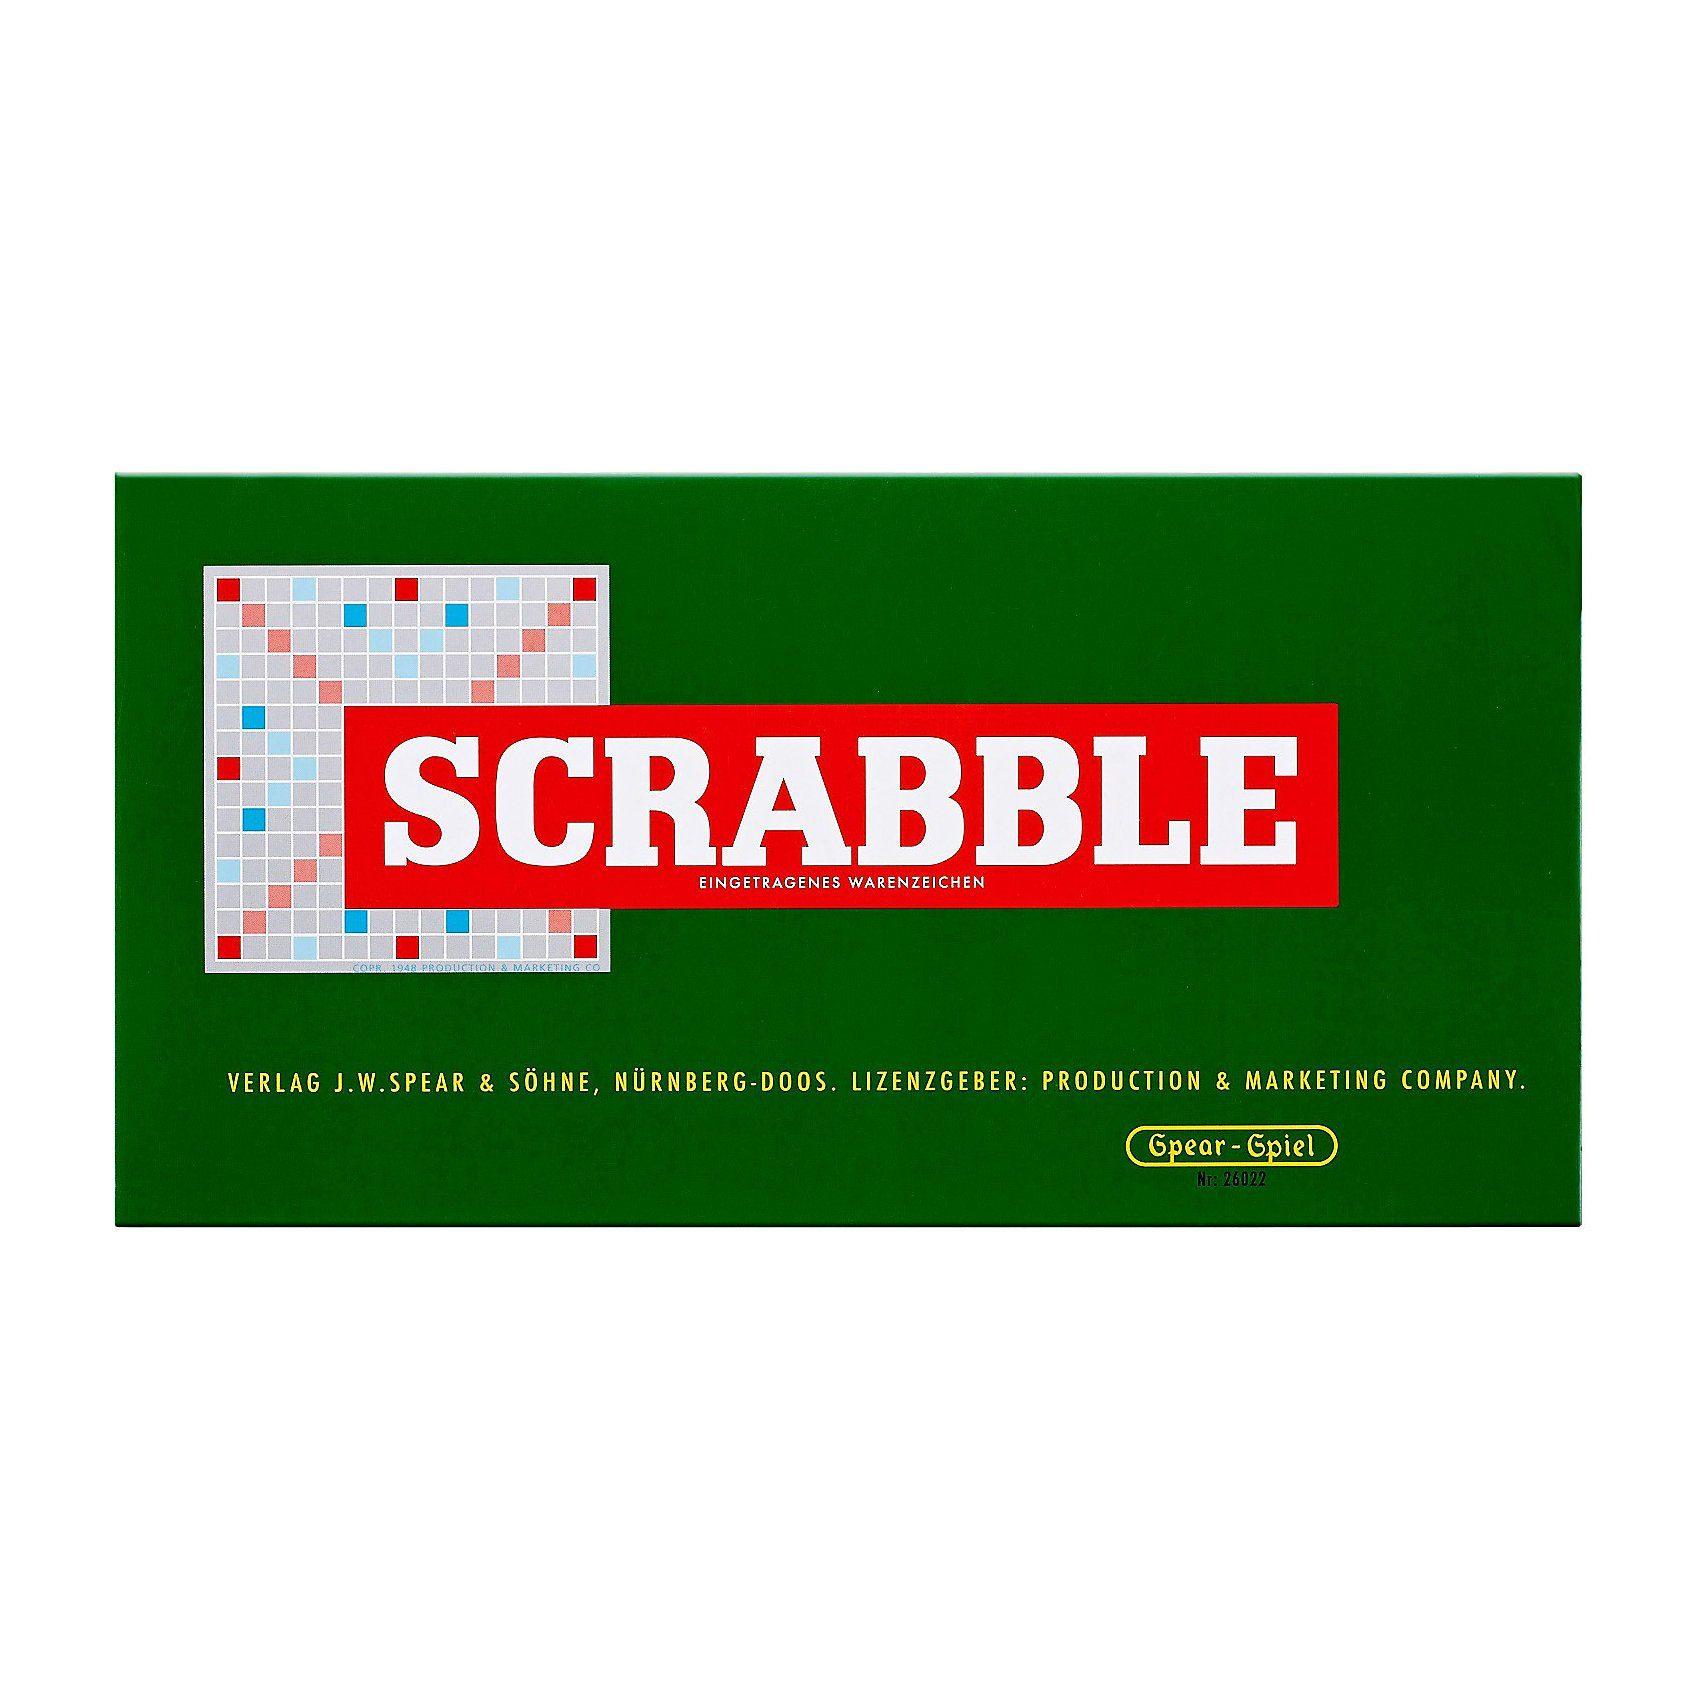 Piatnik Scrabble Jubiläumsausgabe